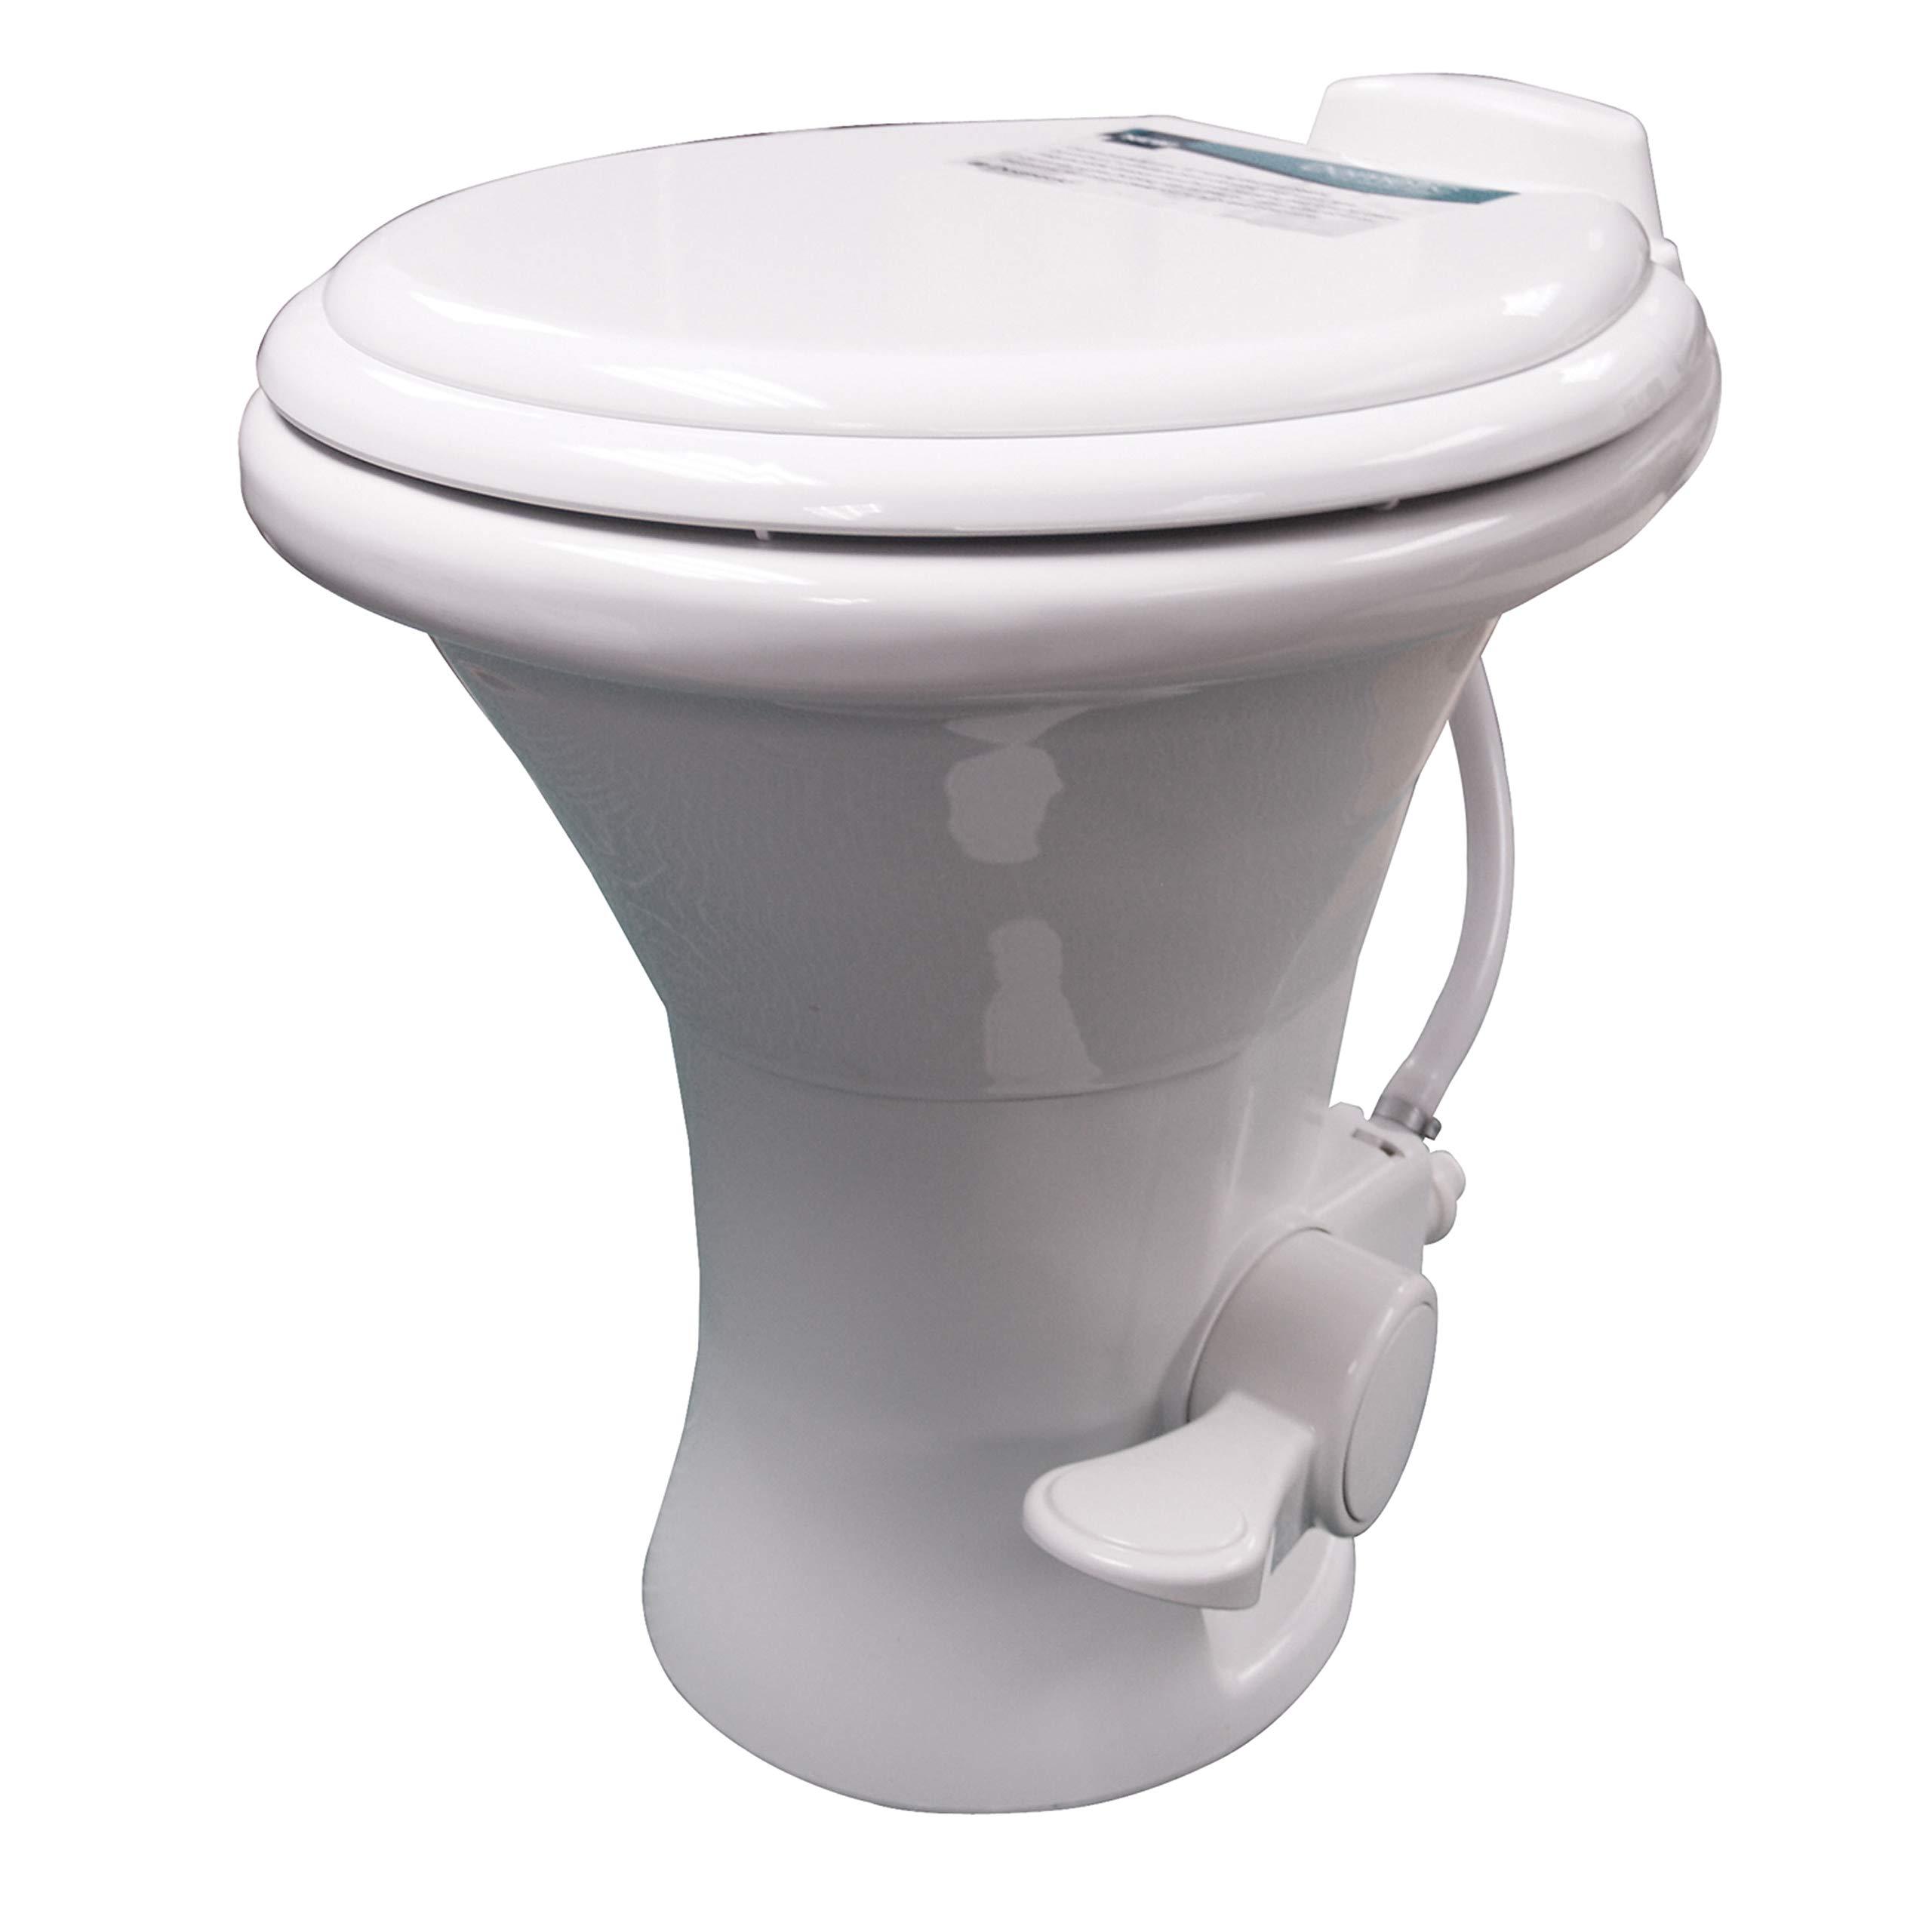 Dometic Sanitation 302310083 310 Toilet Bone Std by Dometic